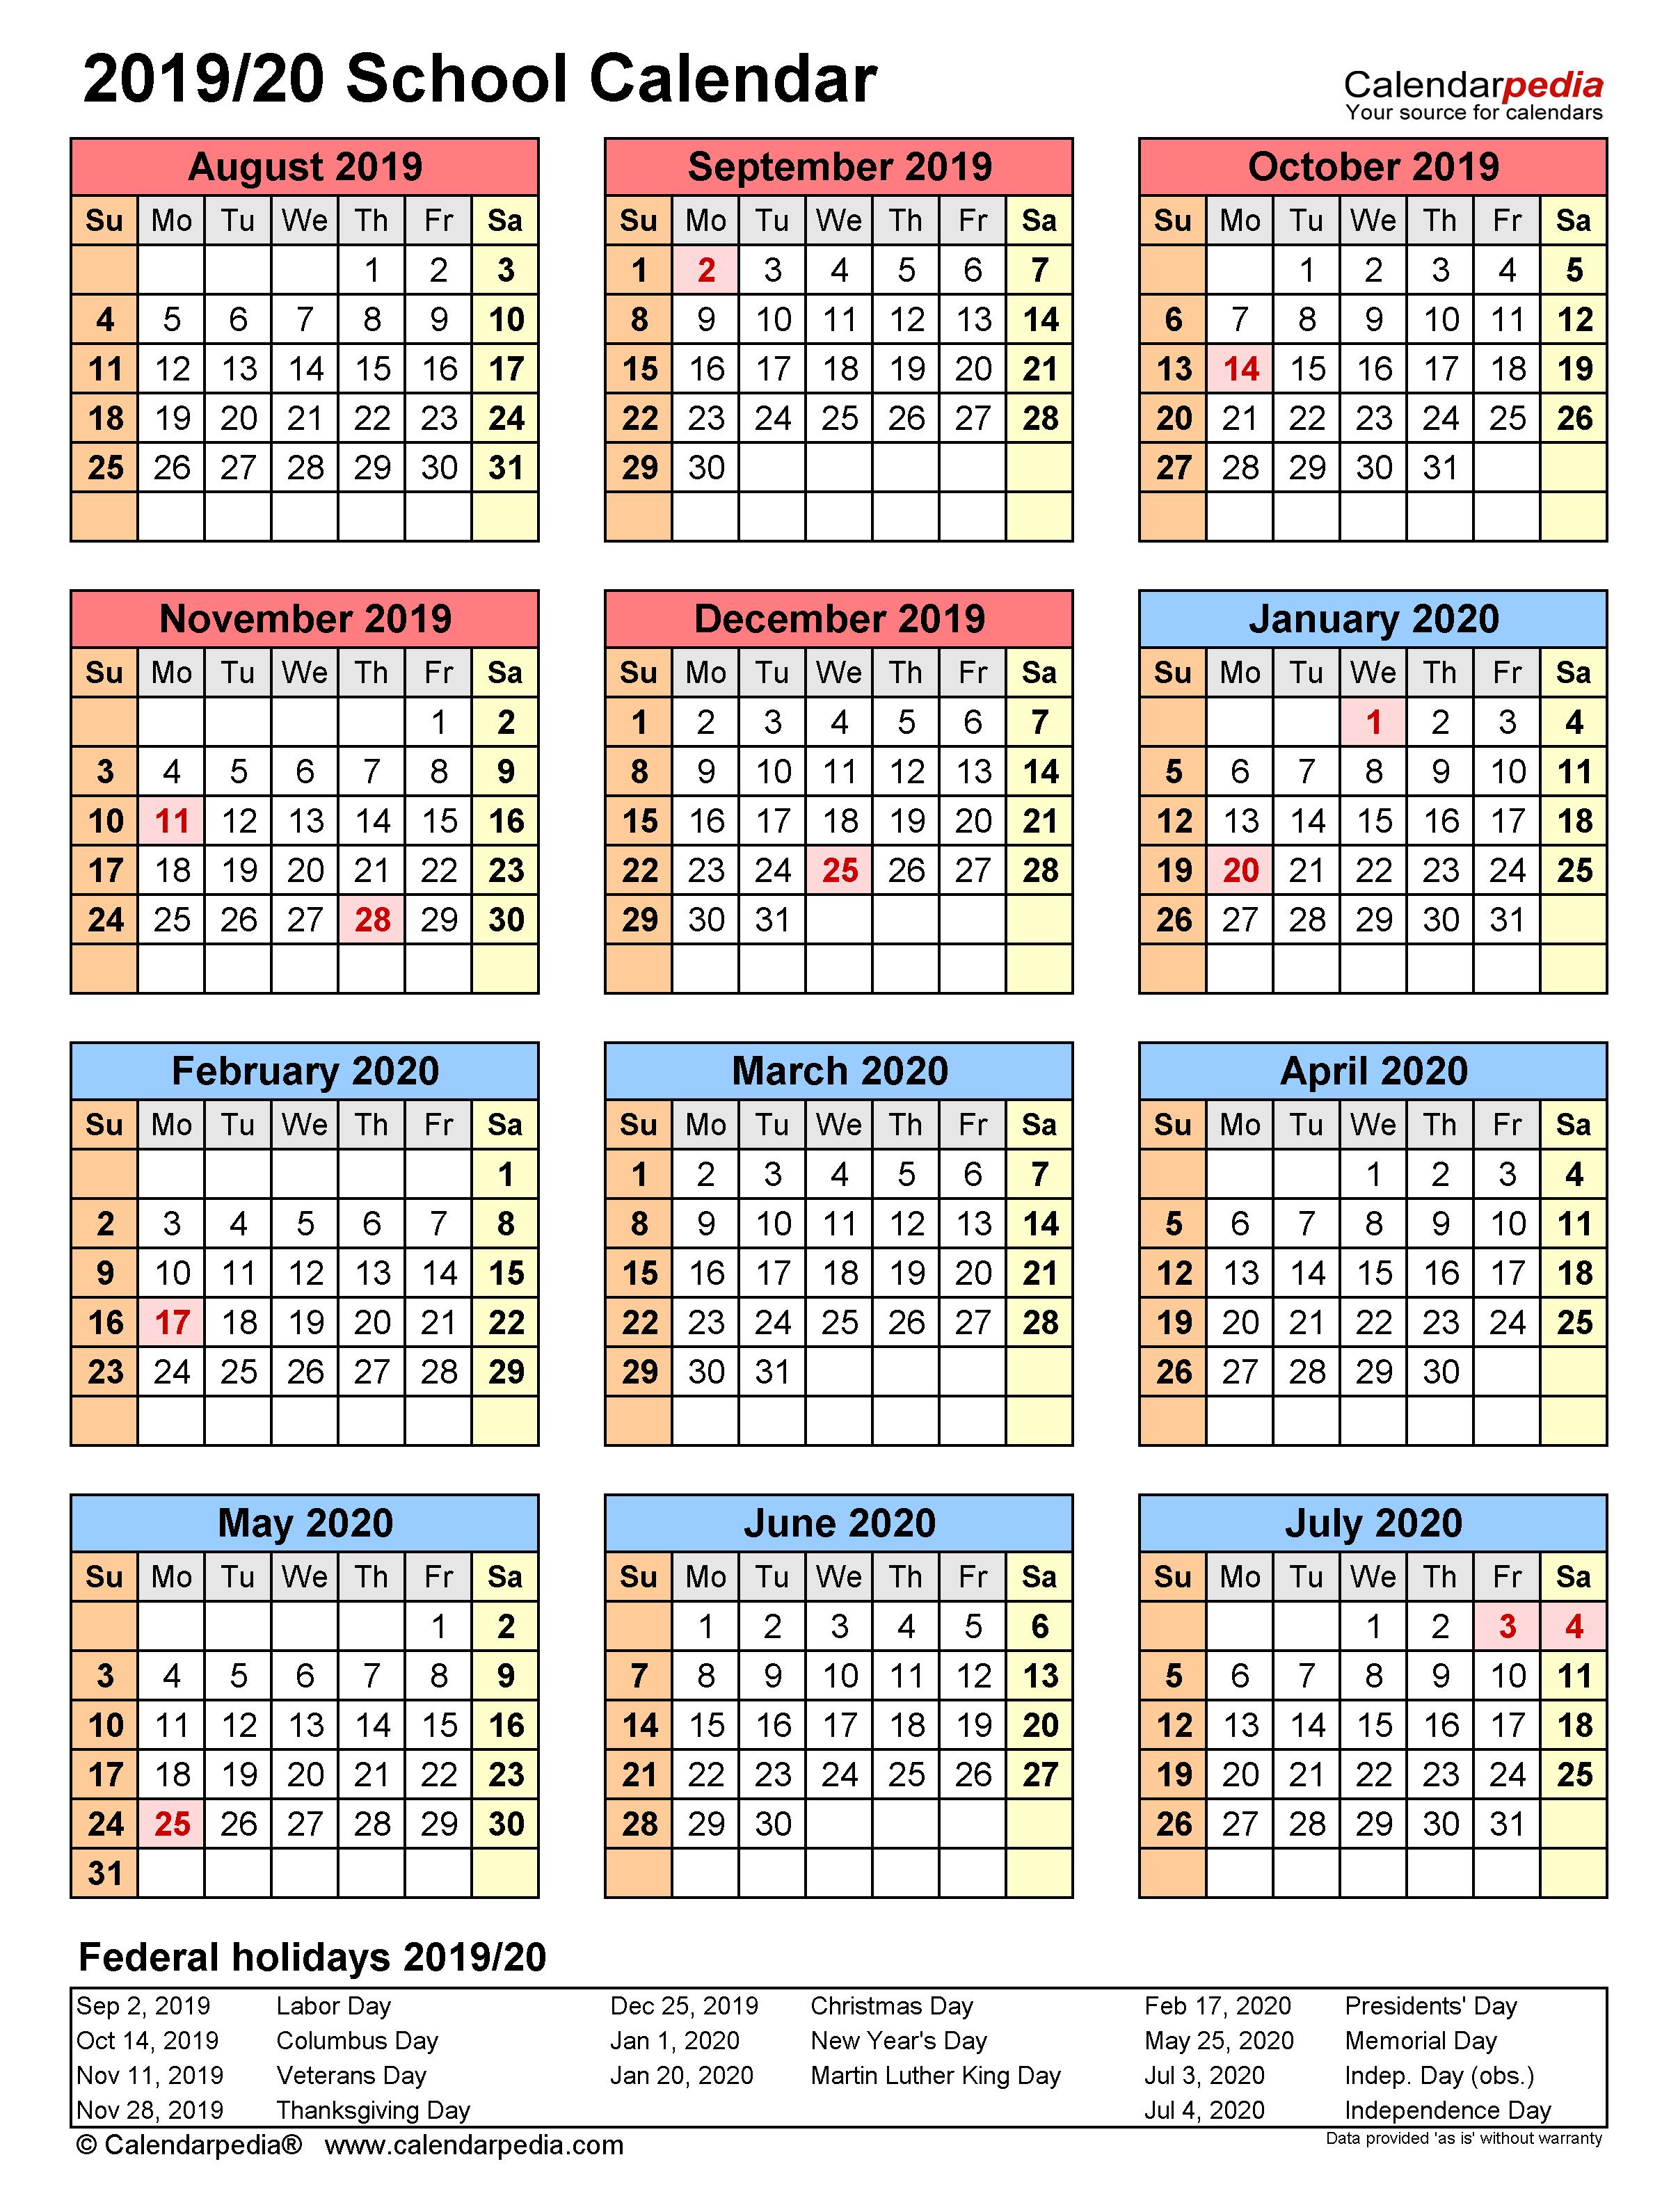 School Calendars 2019/2020 - Free Printable Excel Templates In Year Round School Schedule Sample